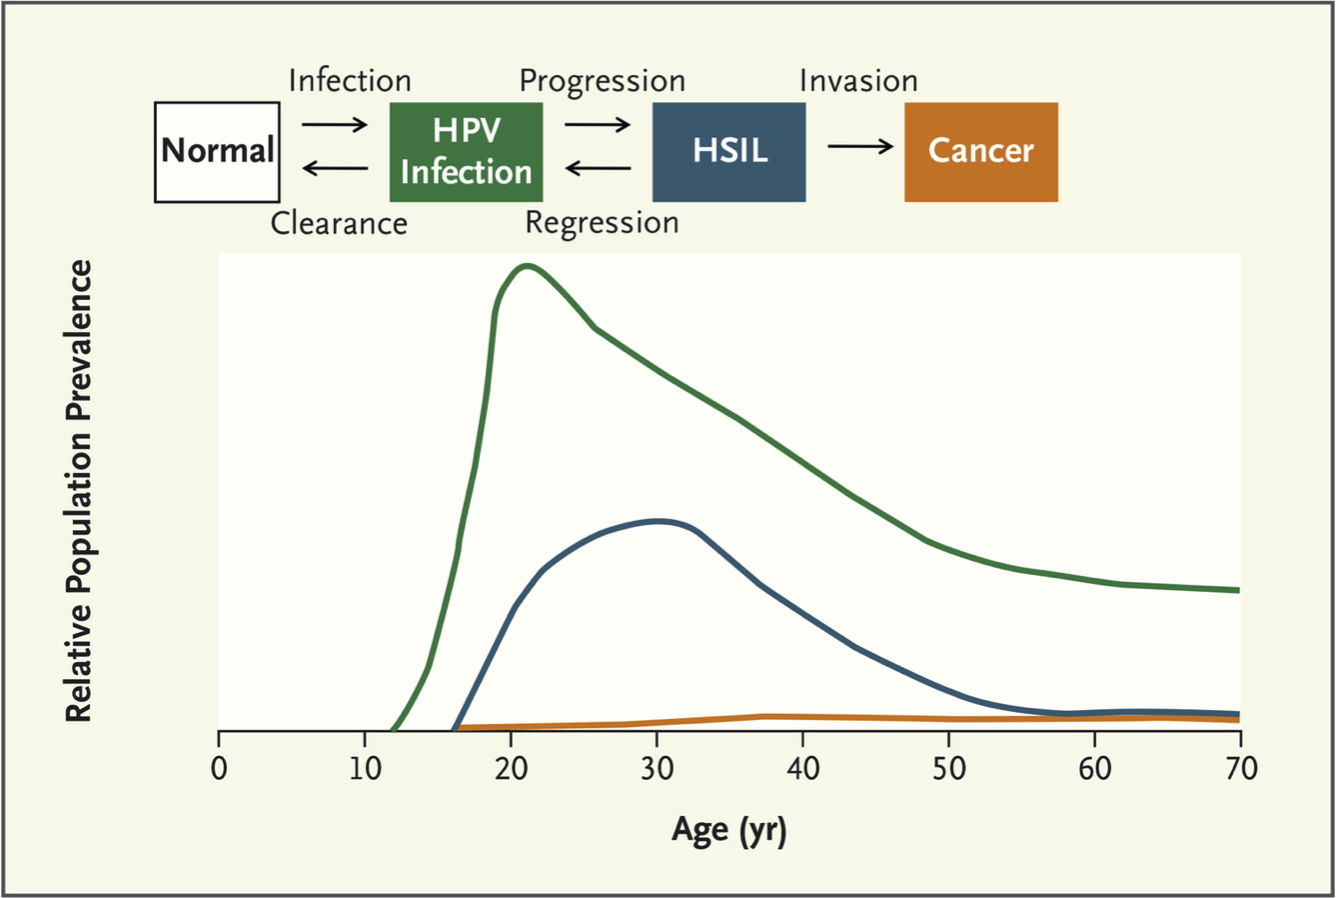 human papillomavirus infection incubation period